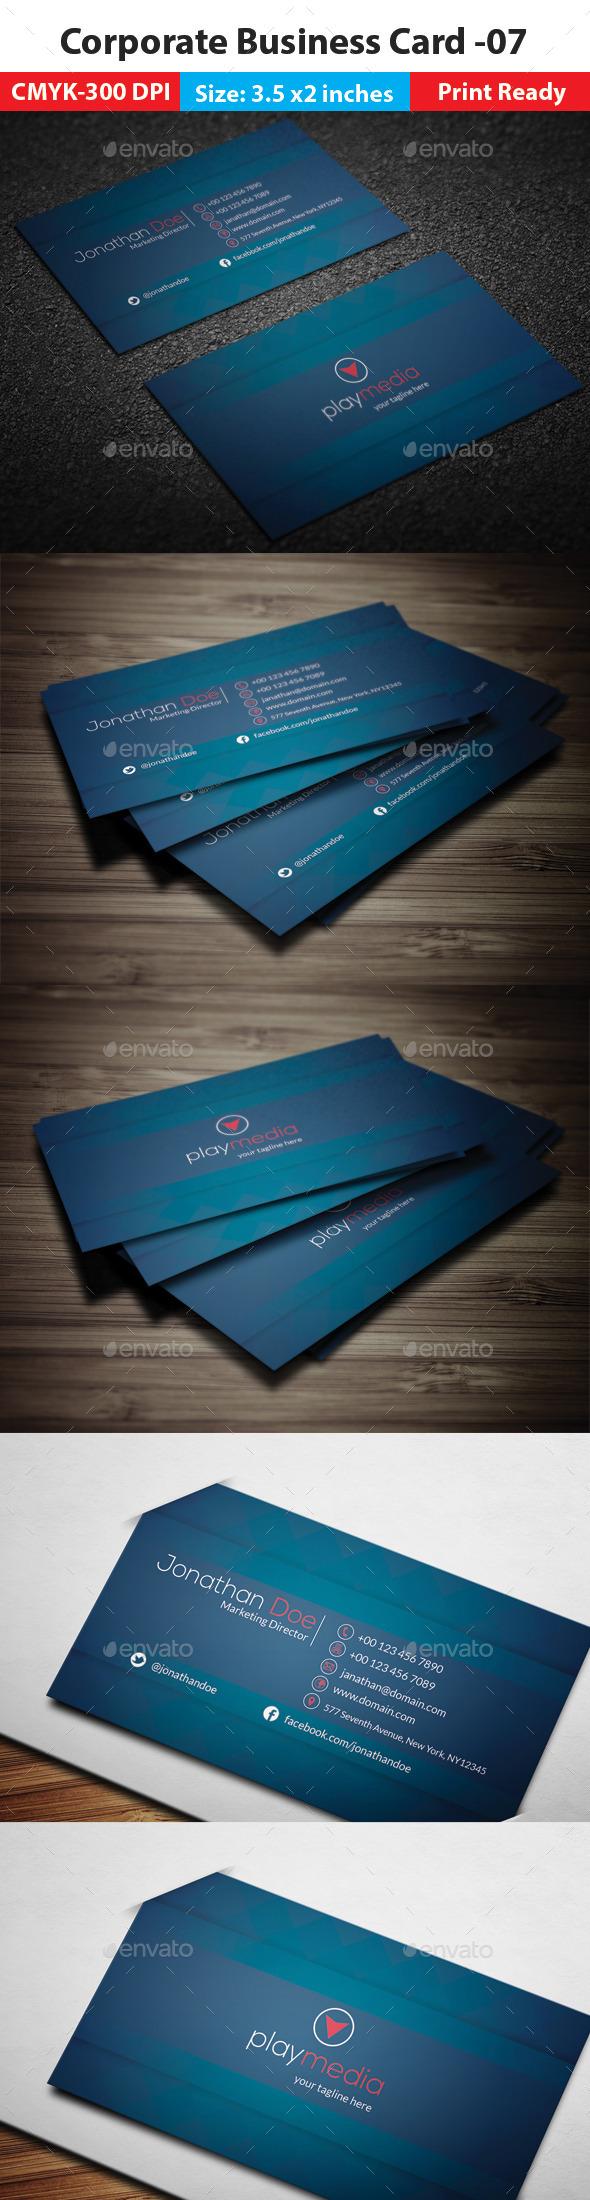 Corporate Business Card -07 - Corporate Business Cards